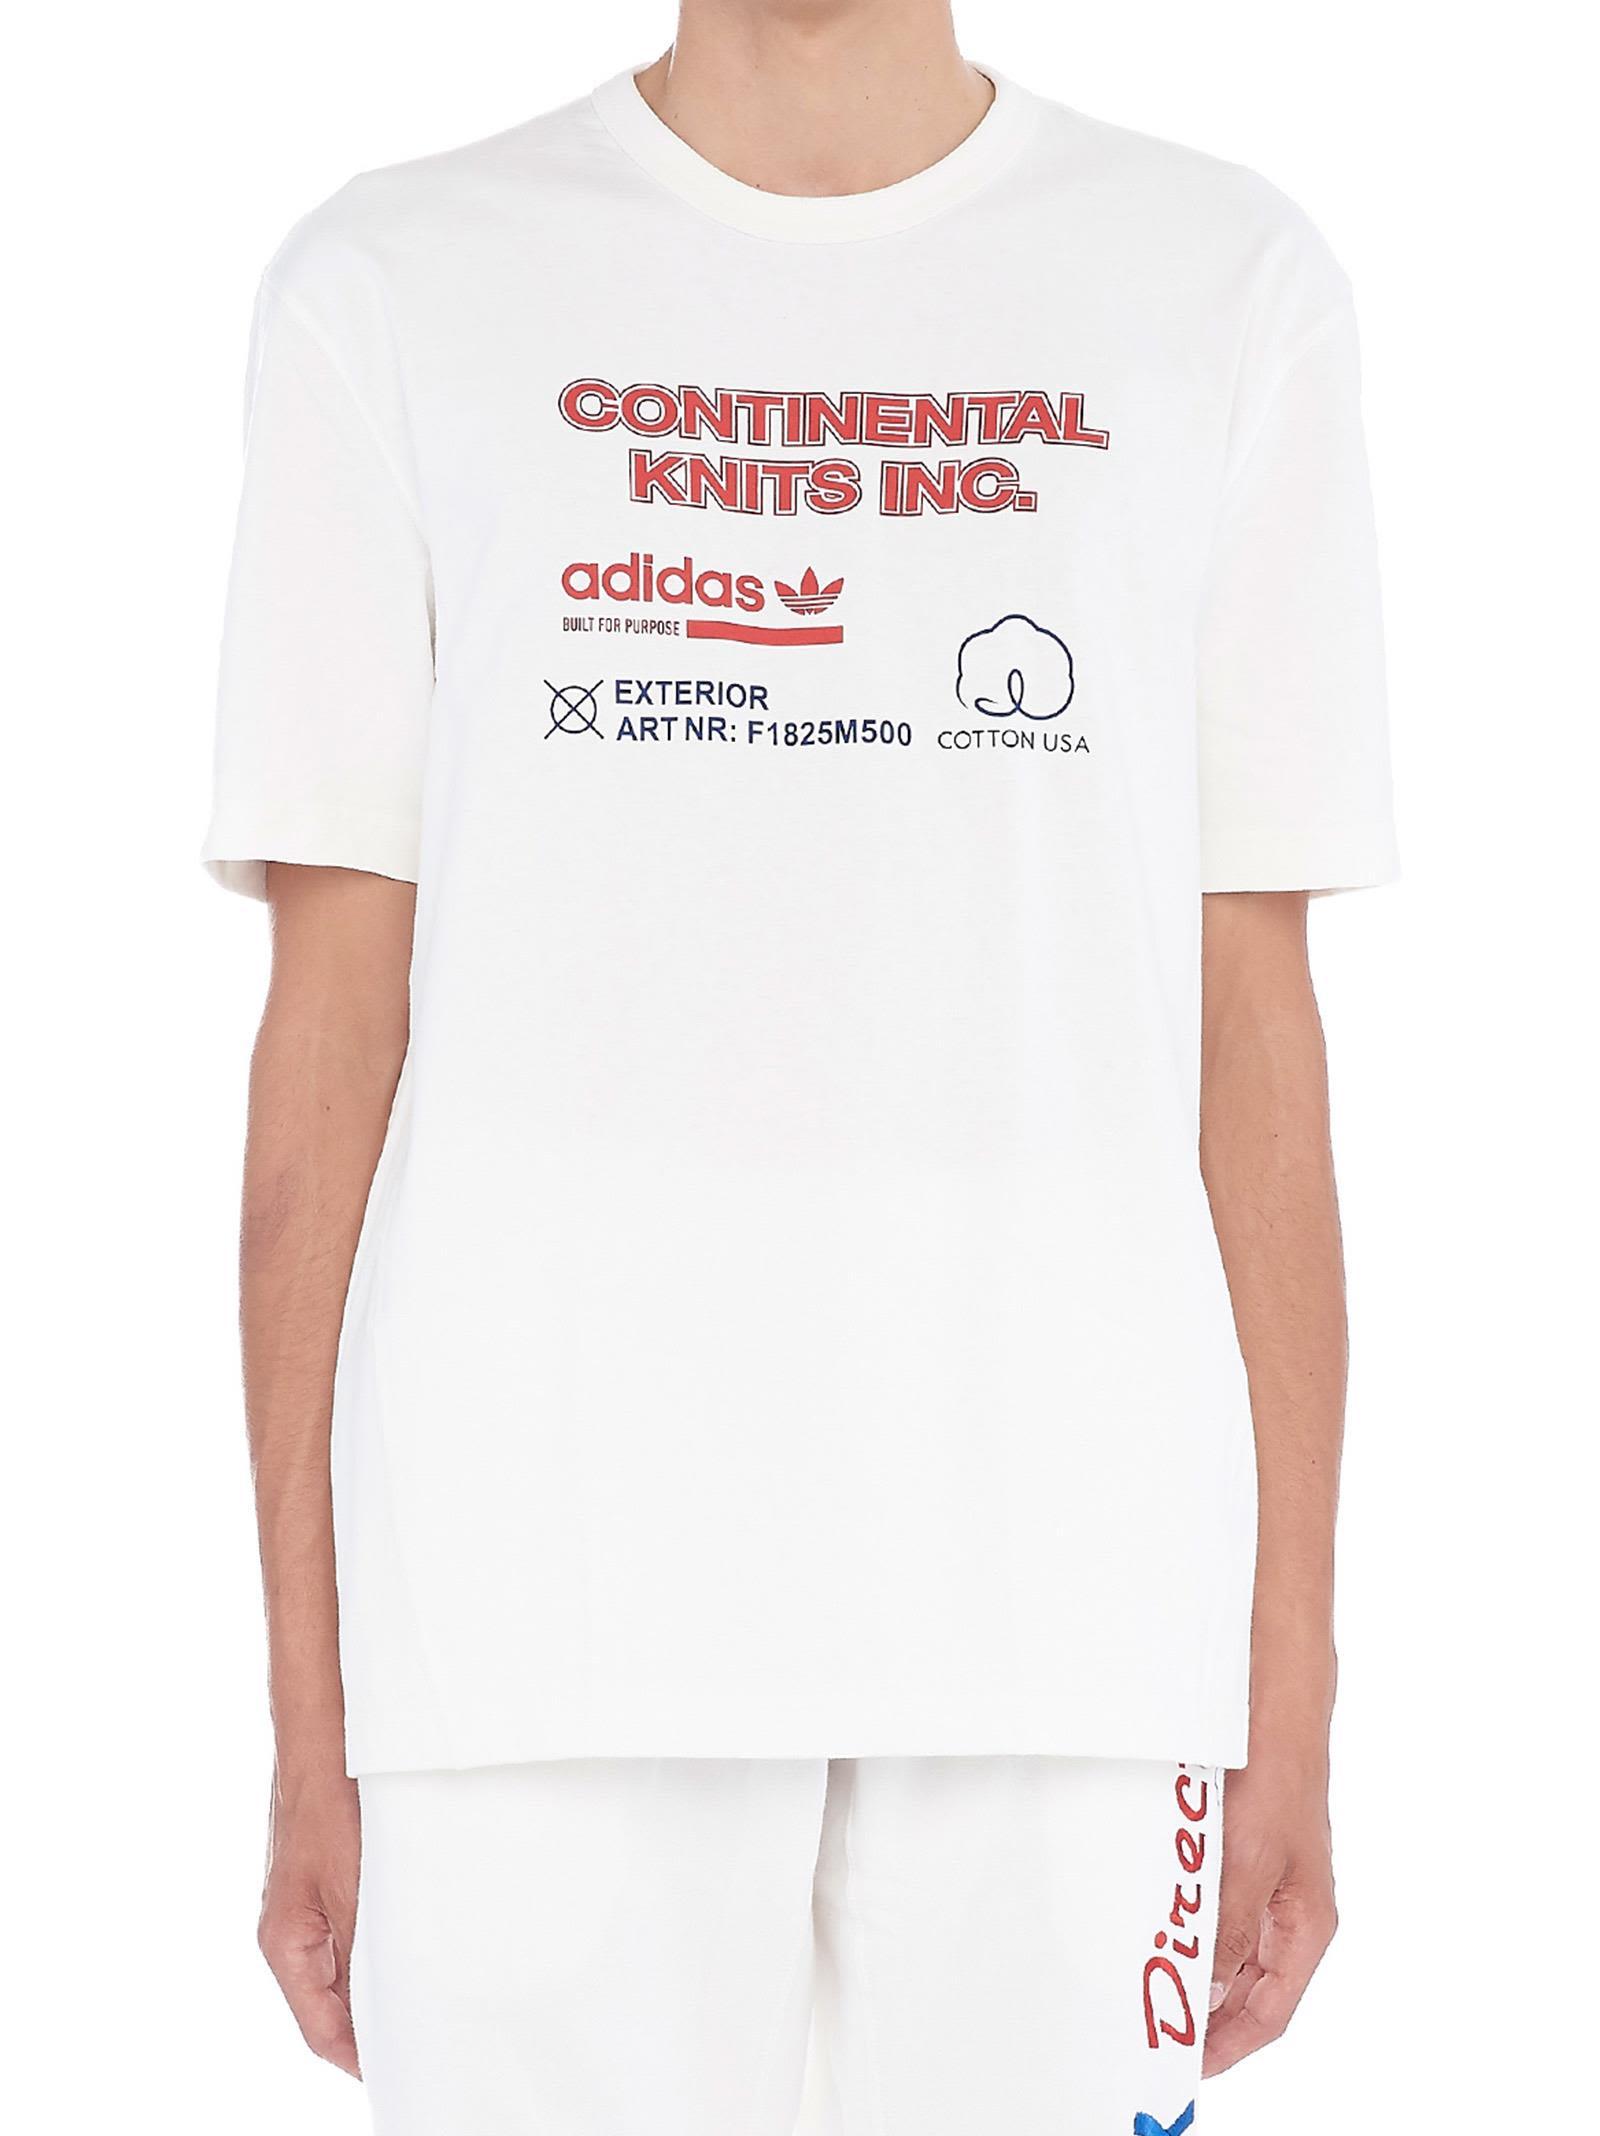 Adidas Originals 'kaval' T-shirt